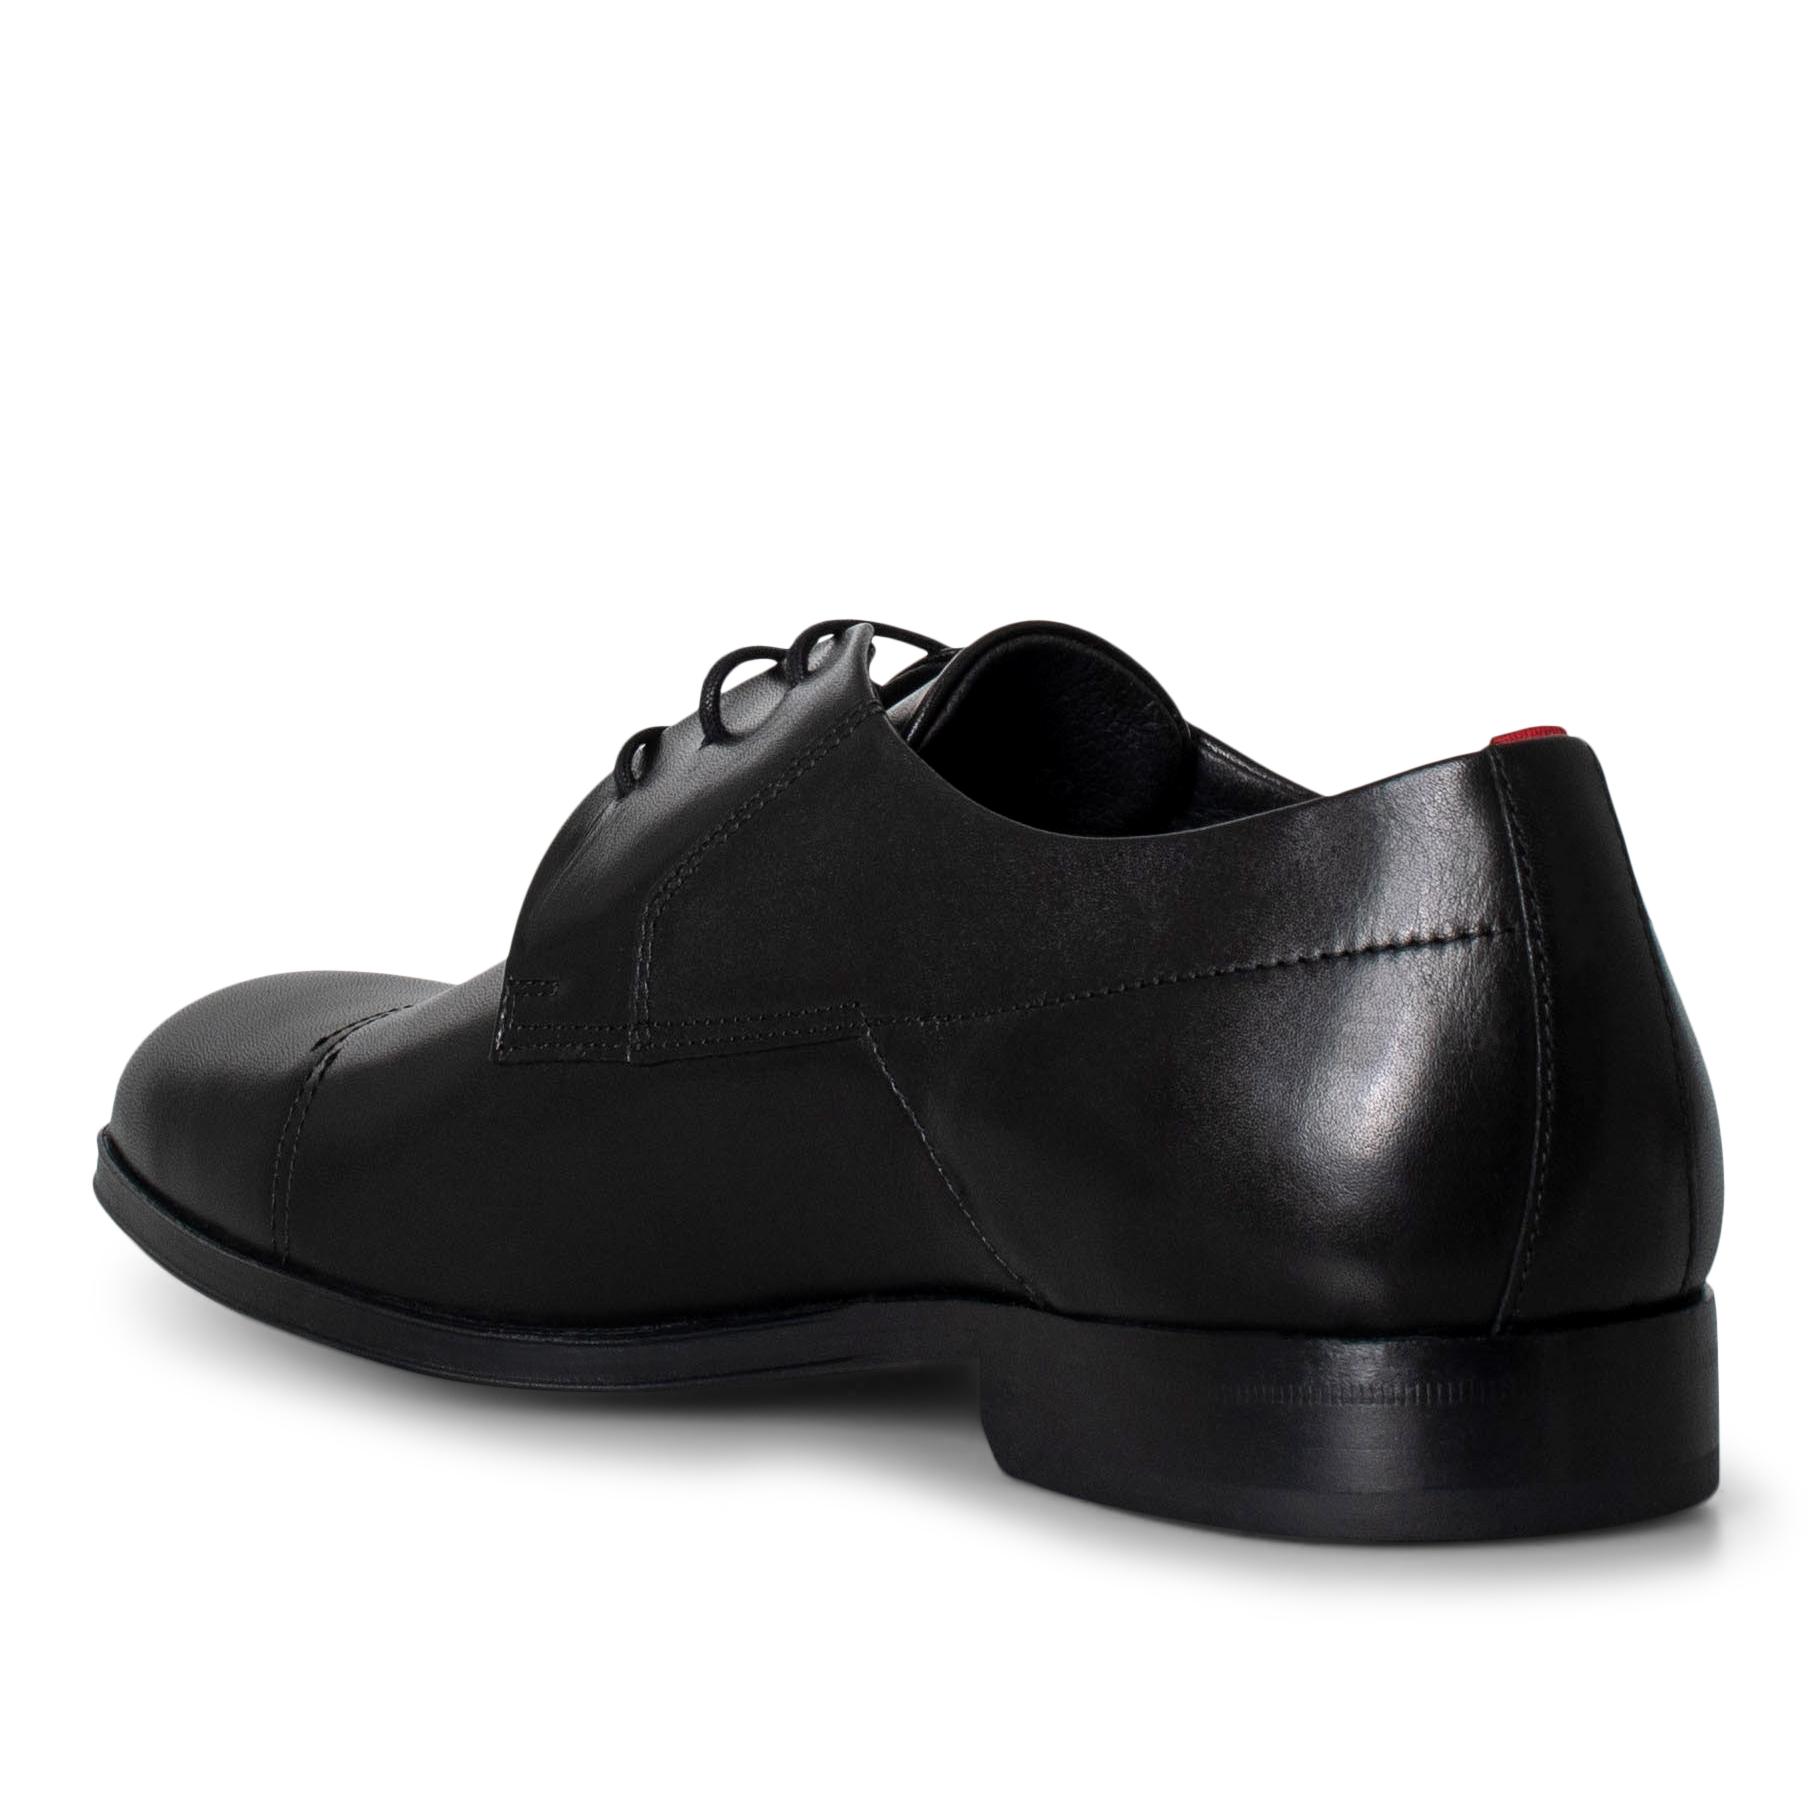 Hugo Boss Derby Lace-up sko, black, 41,5